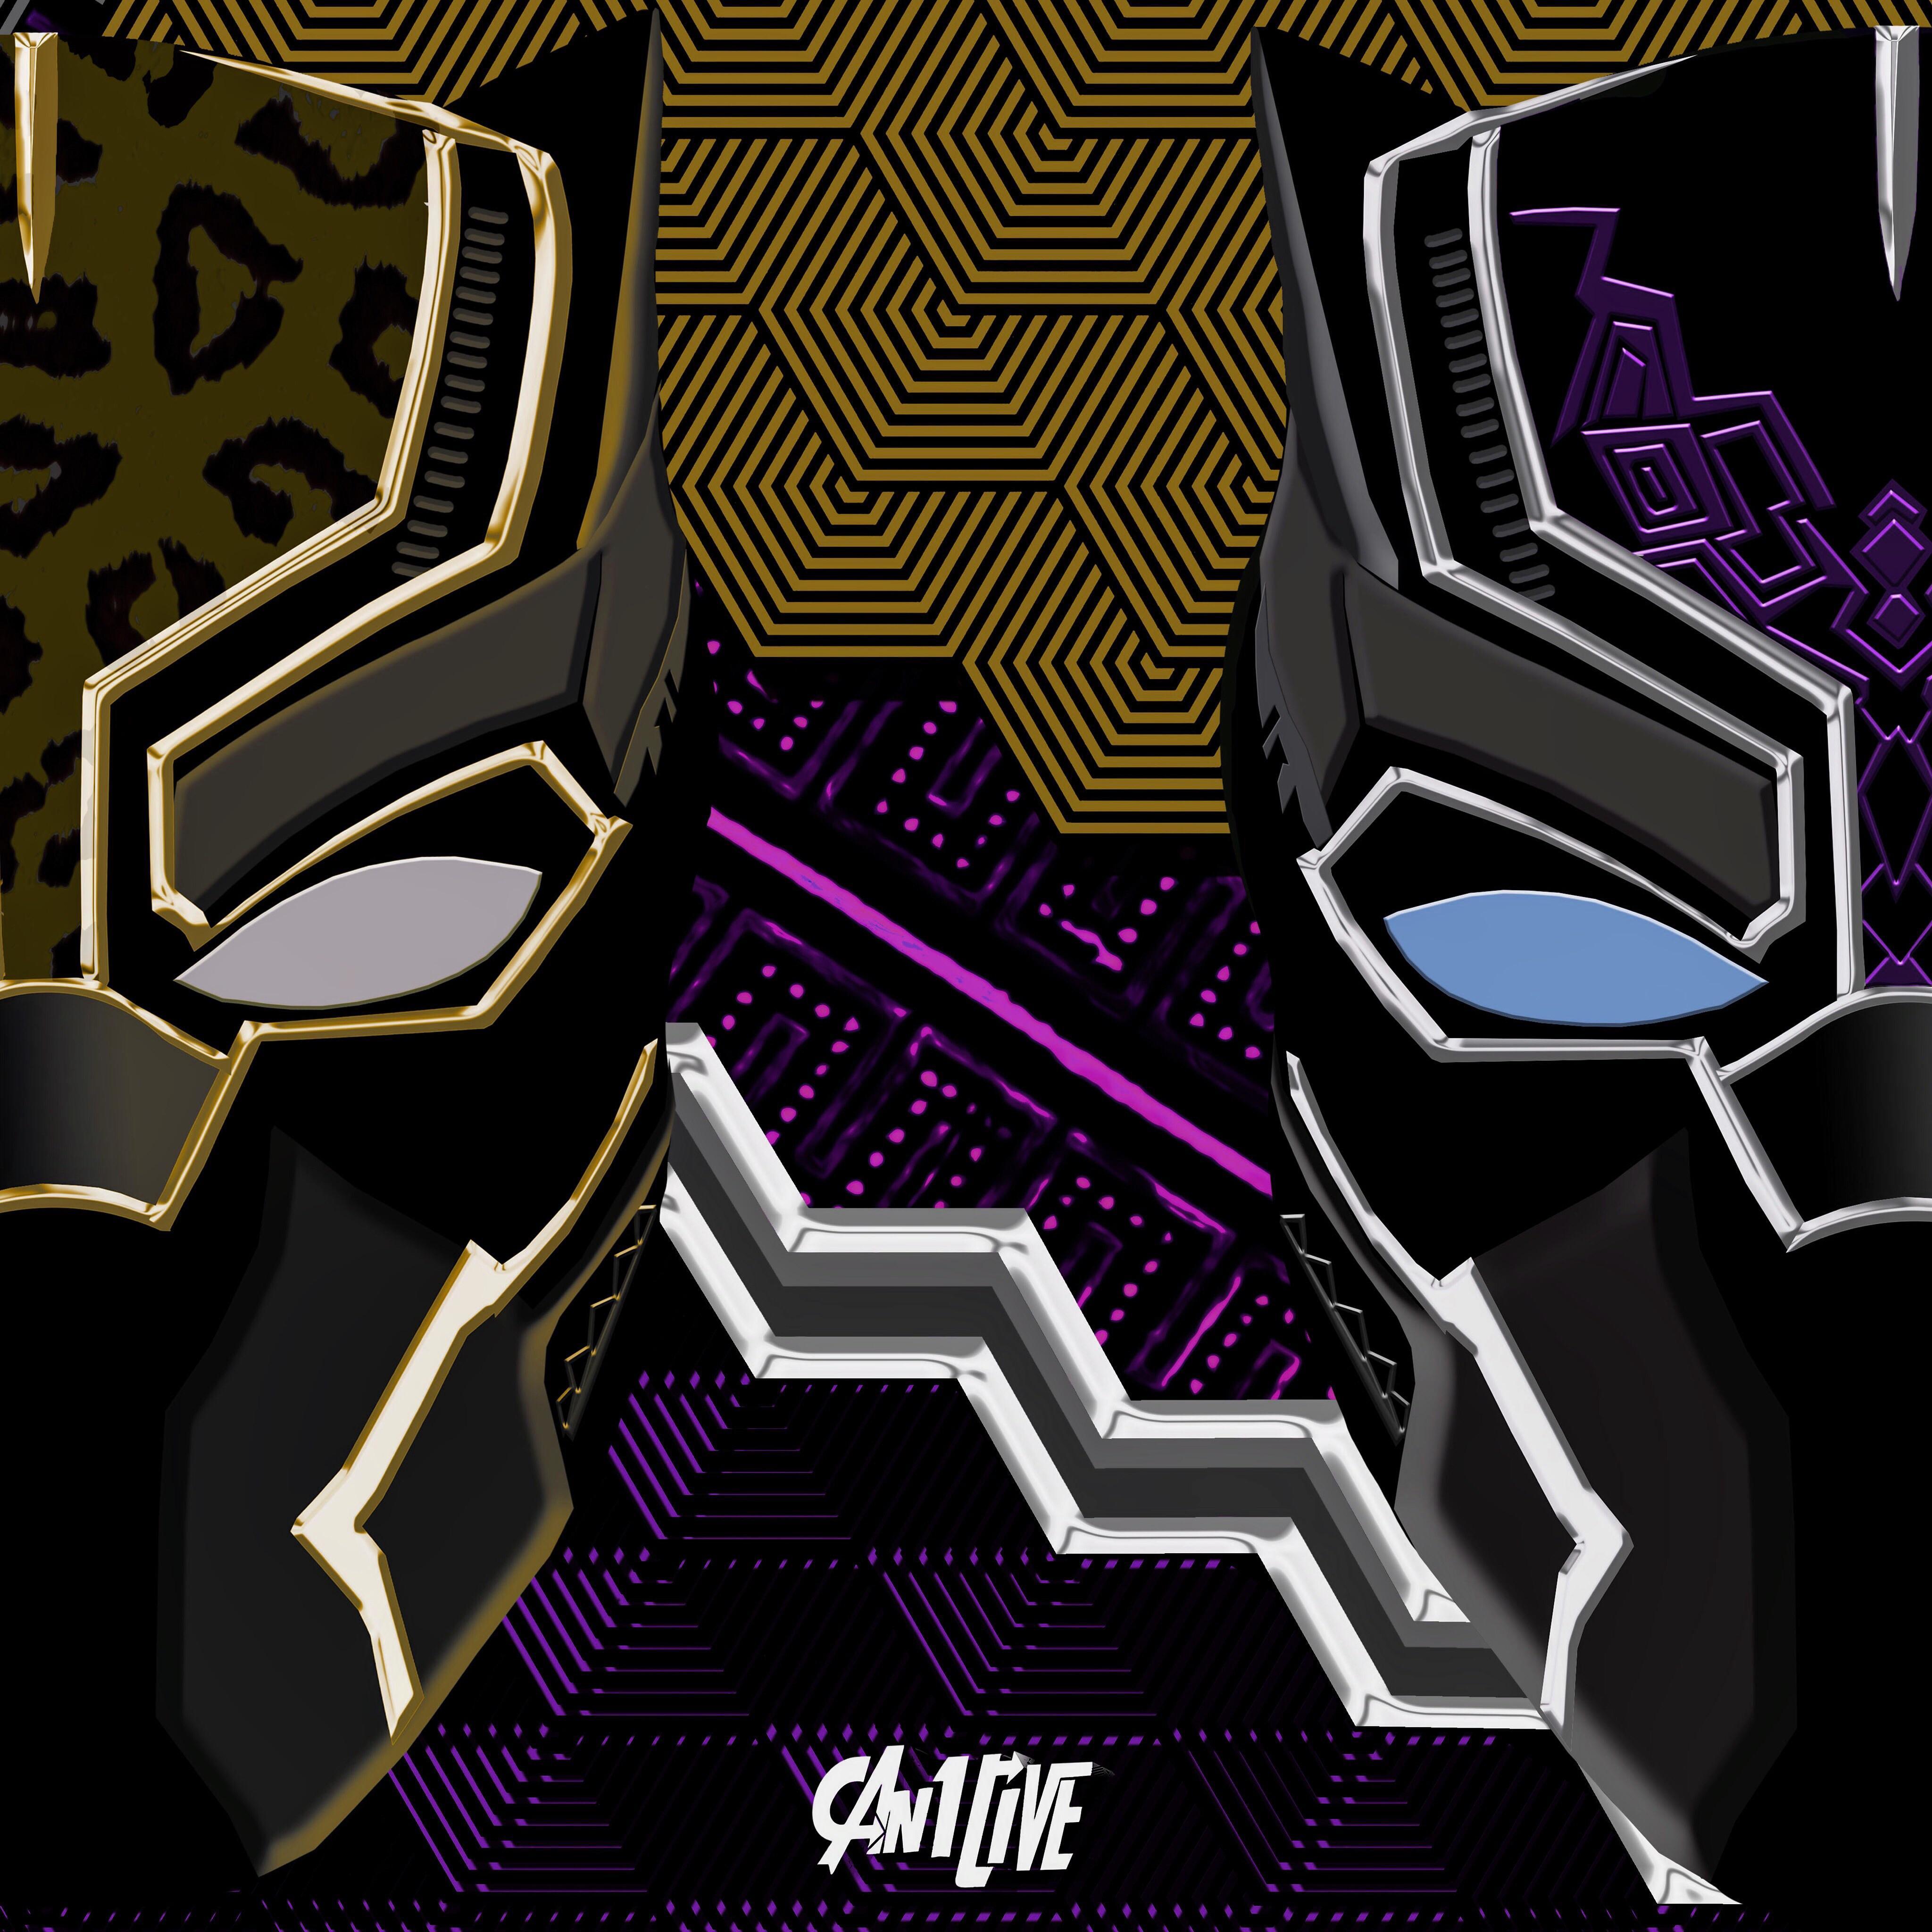 2160x3840 black panther and erik killmonger artwork 4k - Art wallpaper 2160x3840 ...